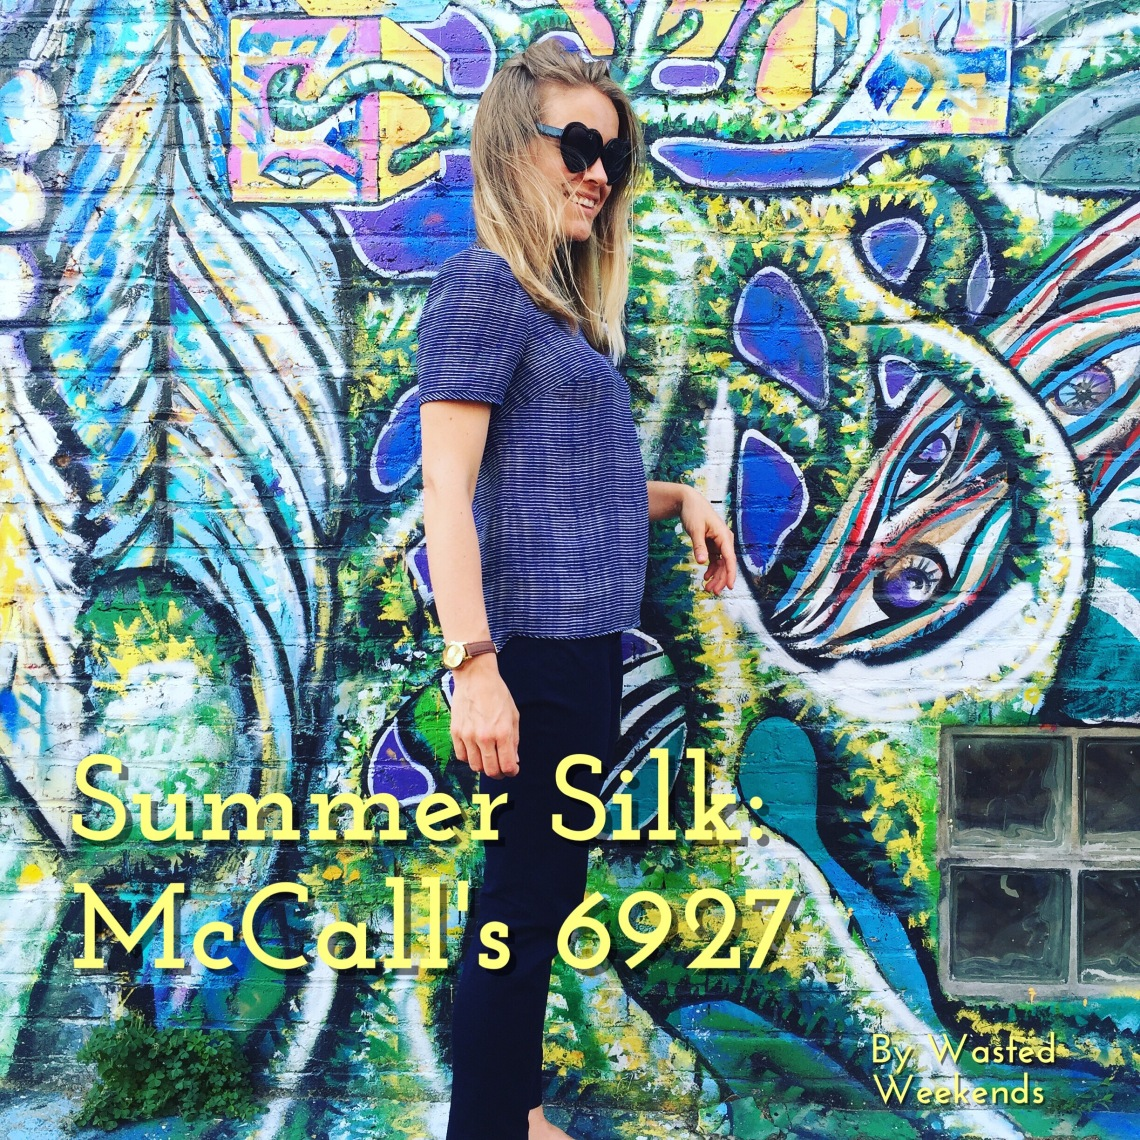 McCalls6927 - 6